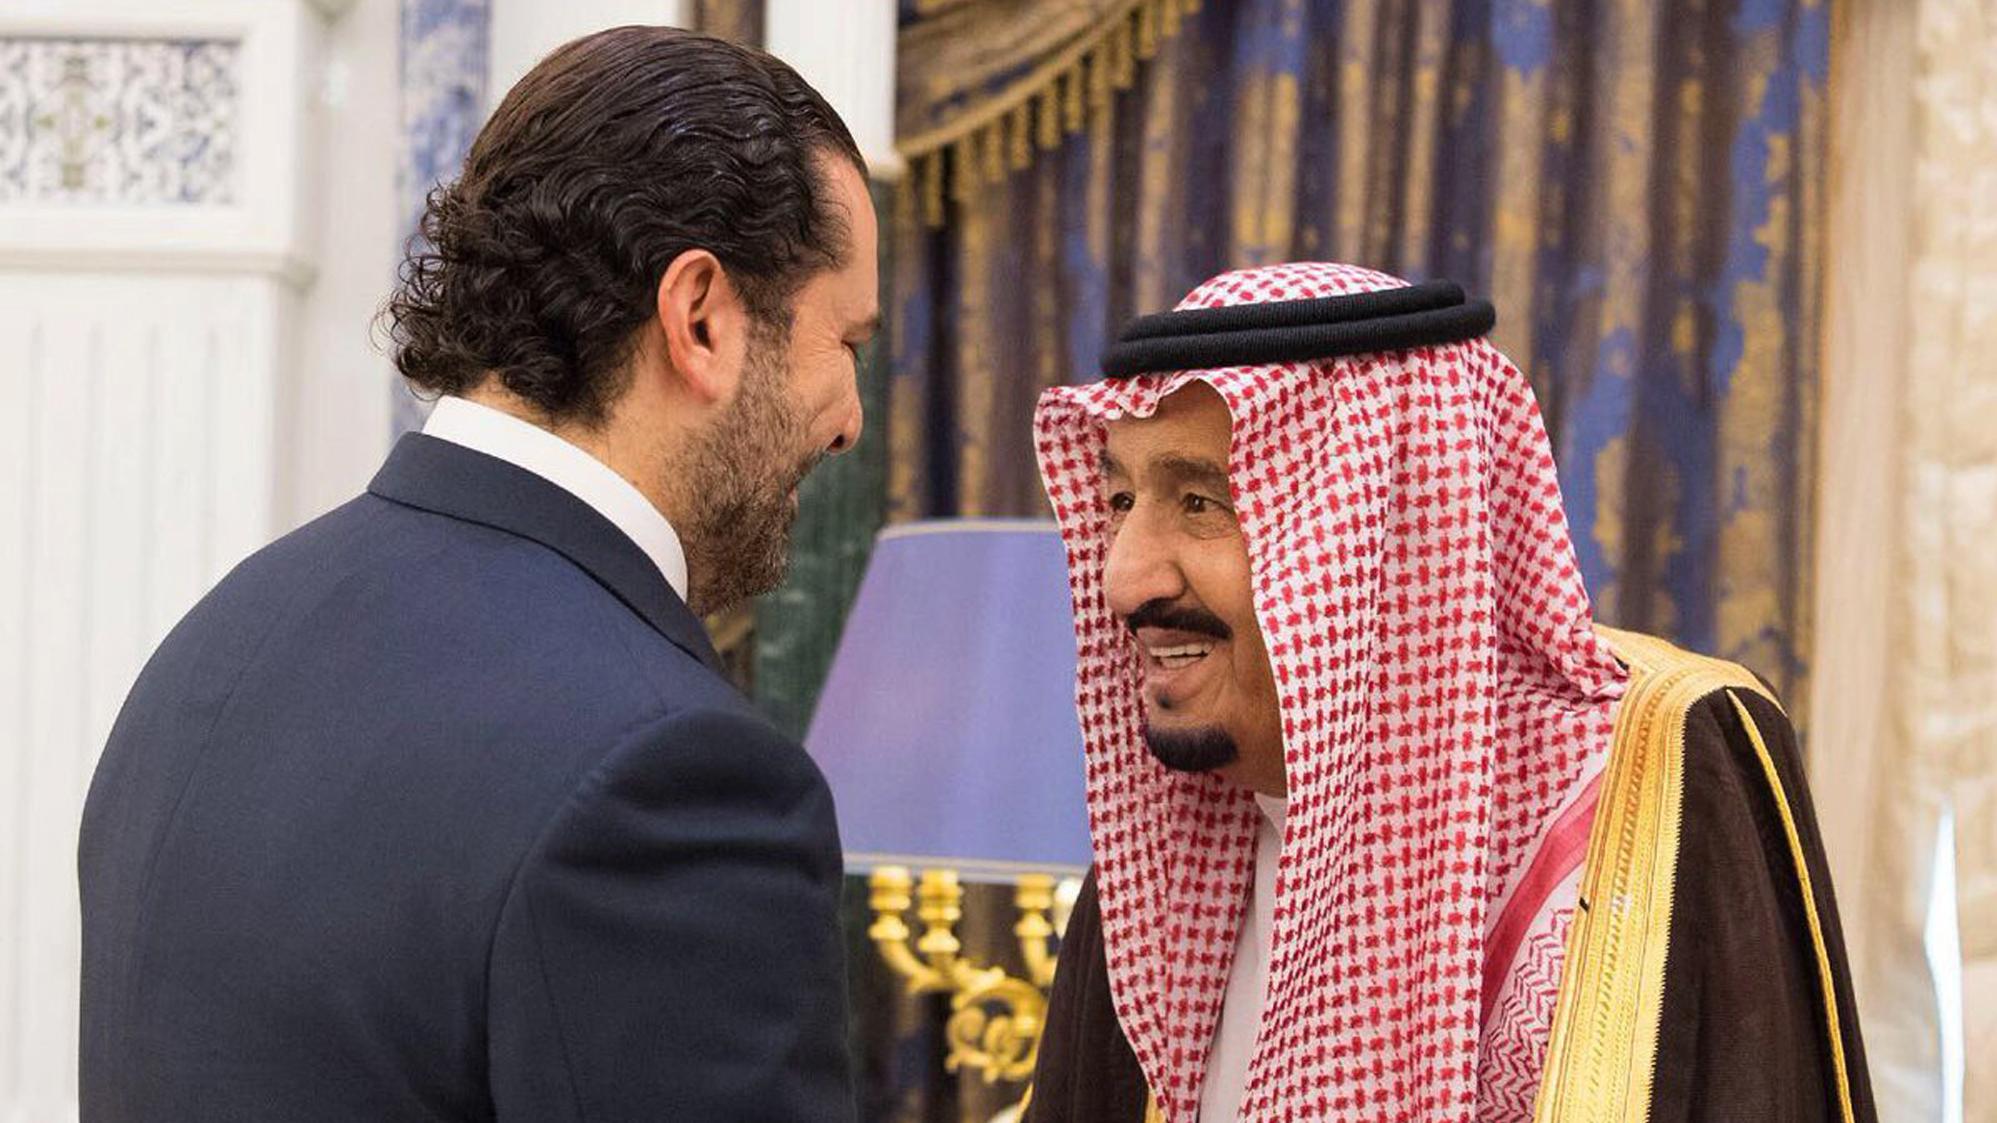 Saudi King Salman (right) shakes hands with outgoing Lebanese Prime Minister Saad Hariri in Riyadh, Saudi Arabia.